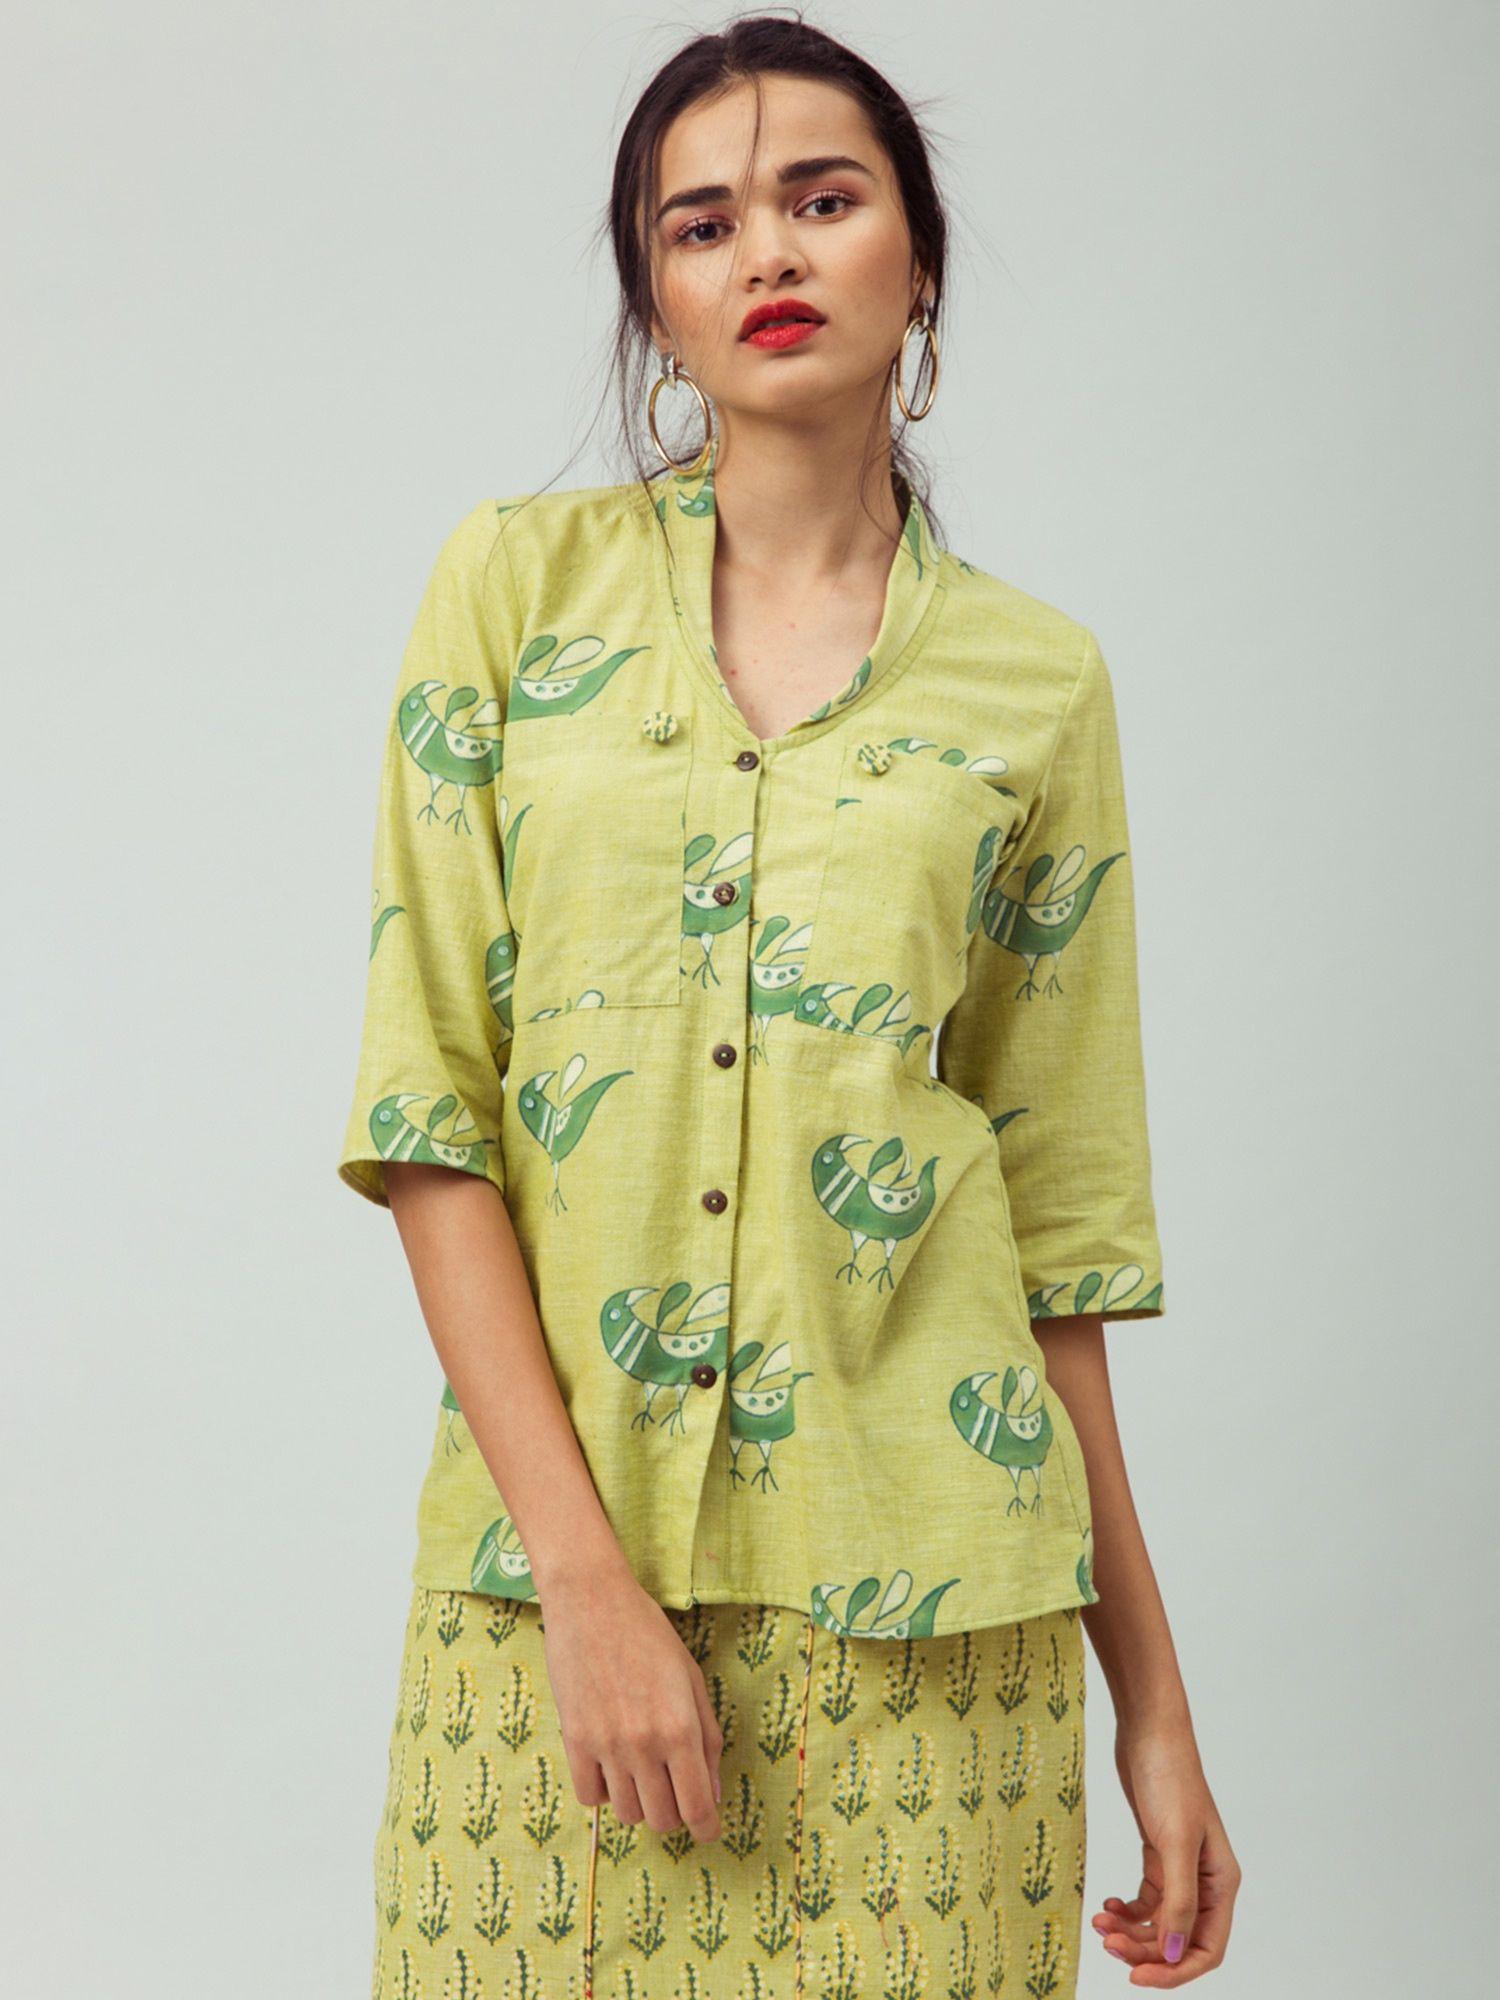 7a6c3877b14807 The Jodi Life Shirts Tops and Crop Tops   Buy The Jodi Life Sage ...